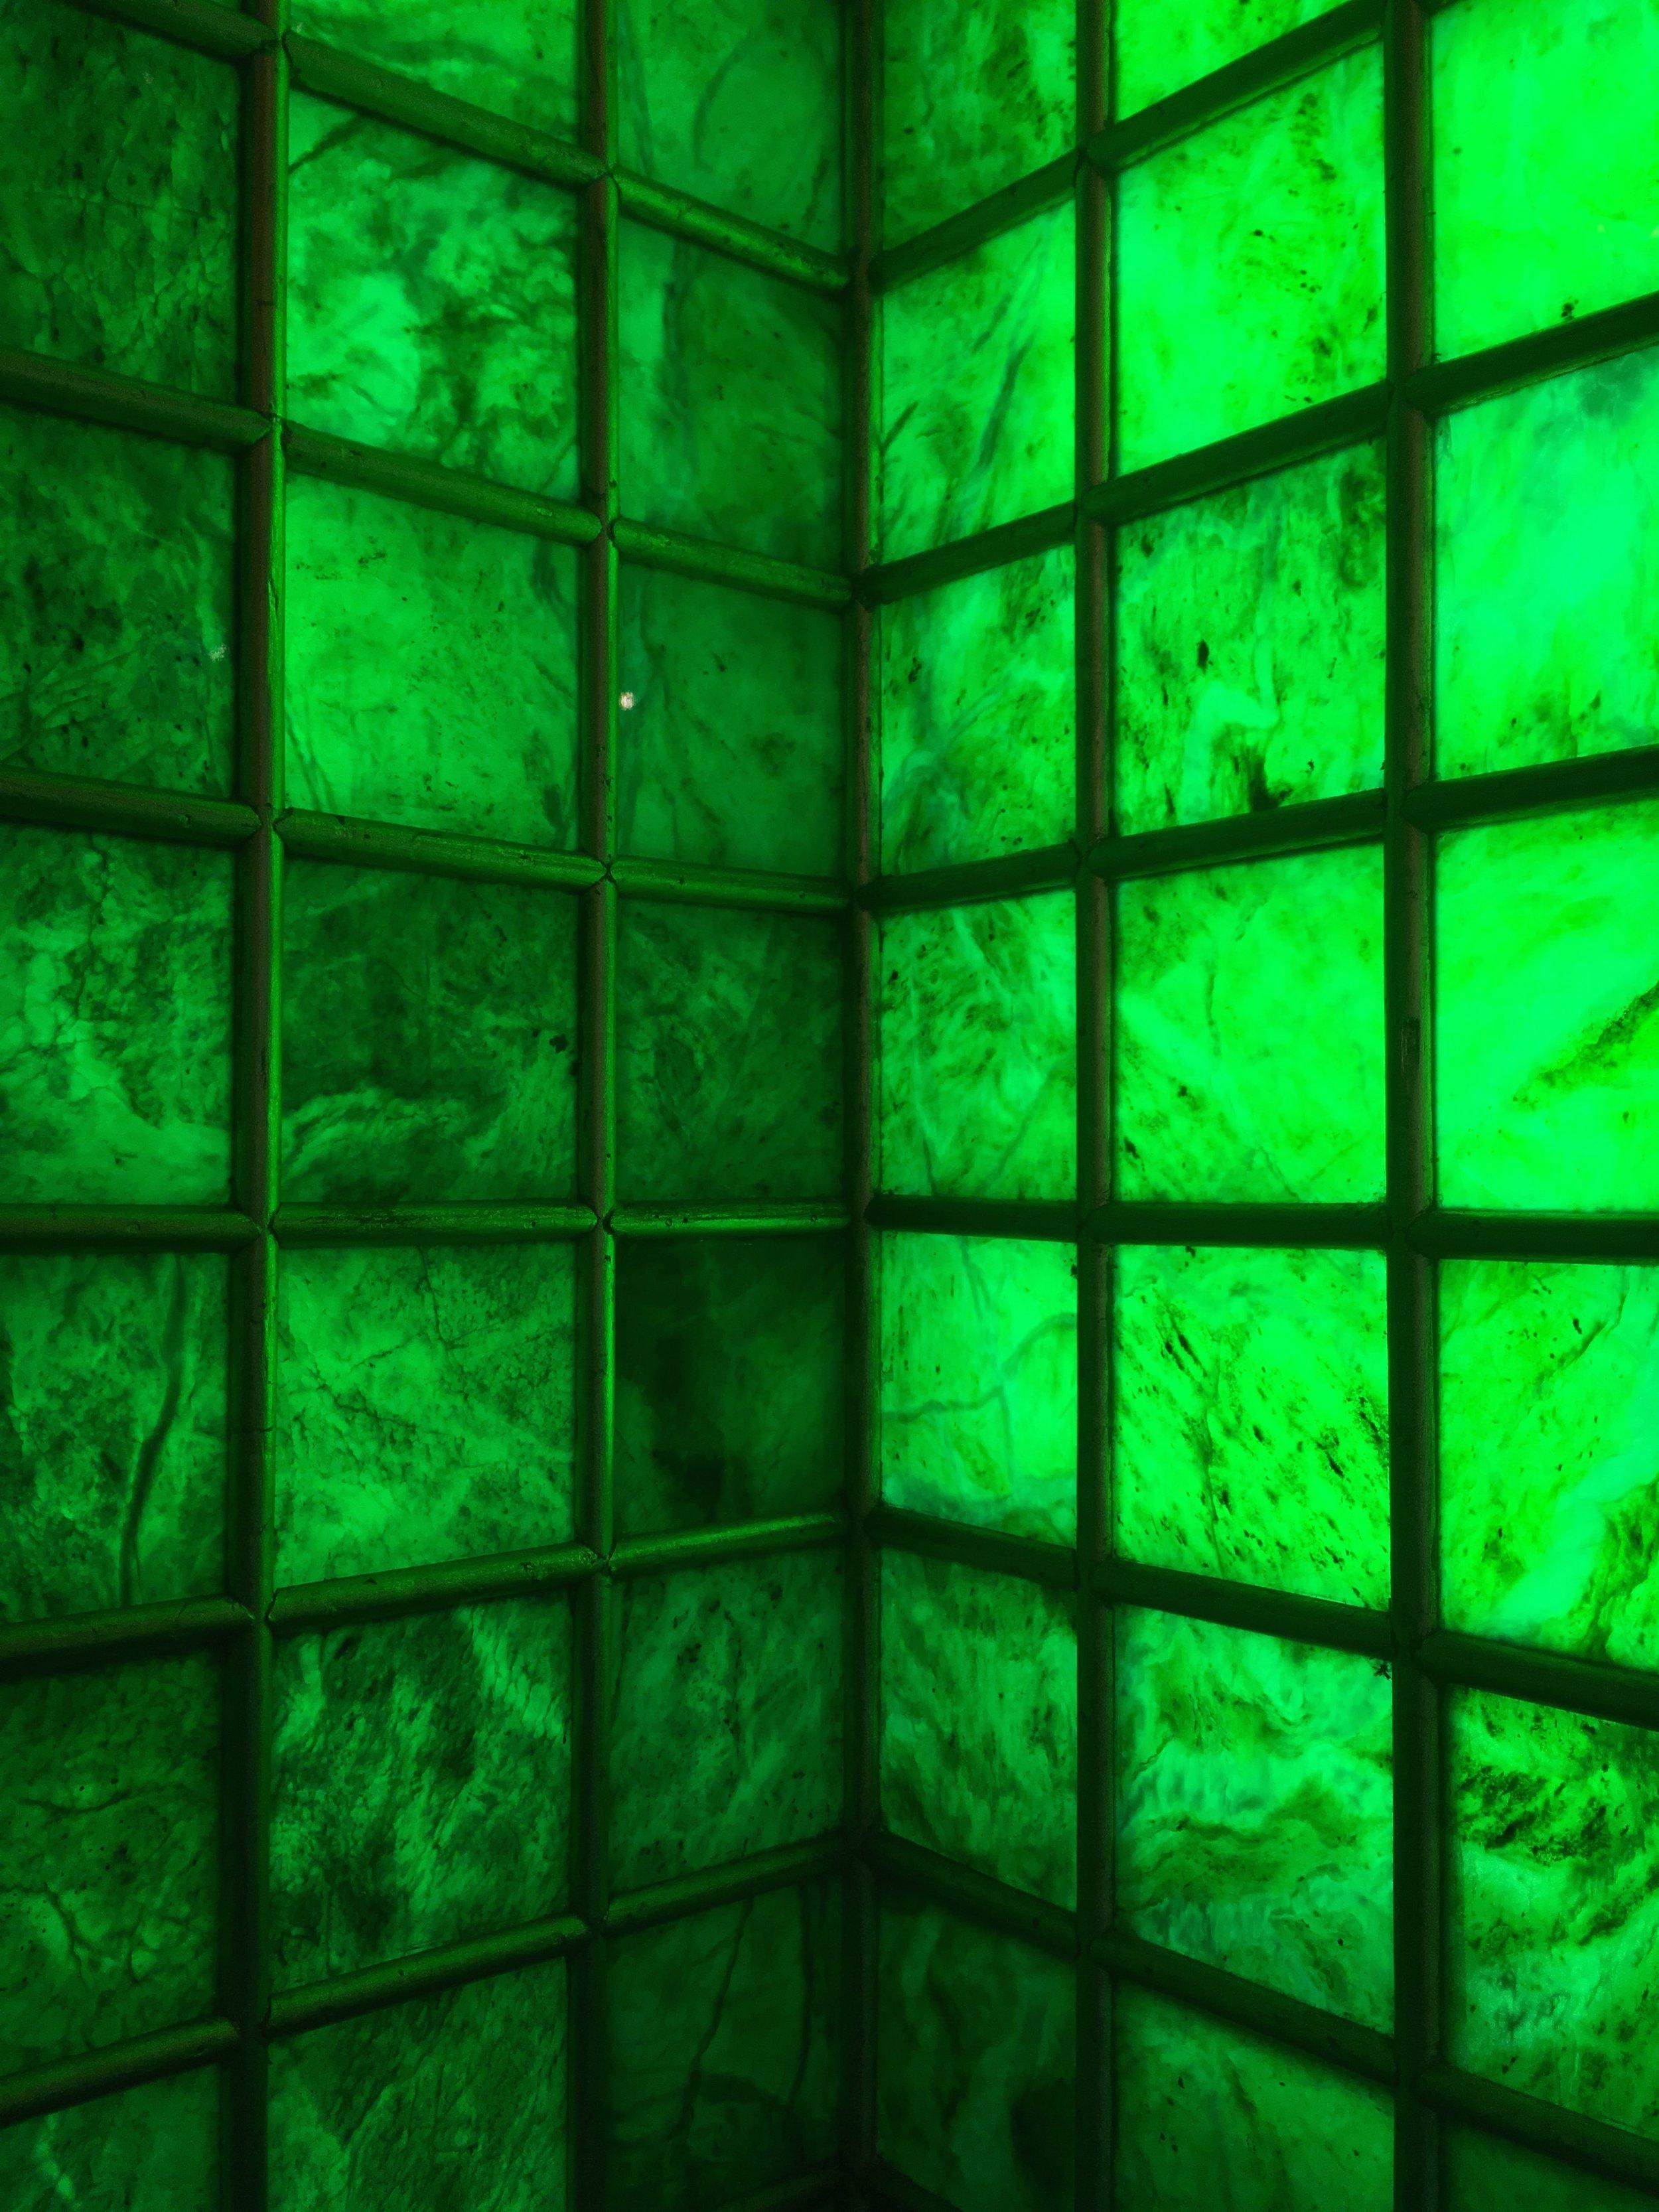 The emerald temple